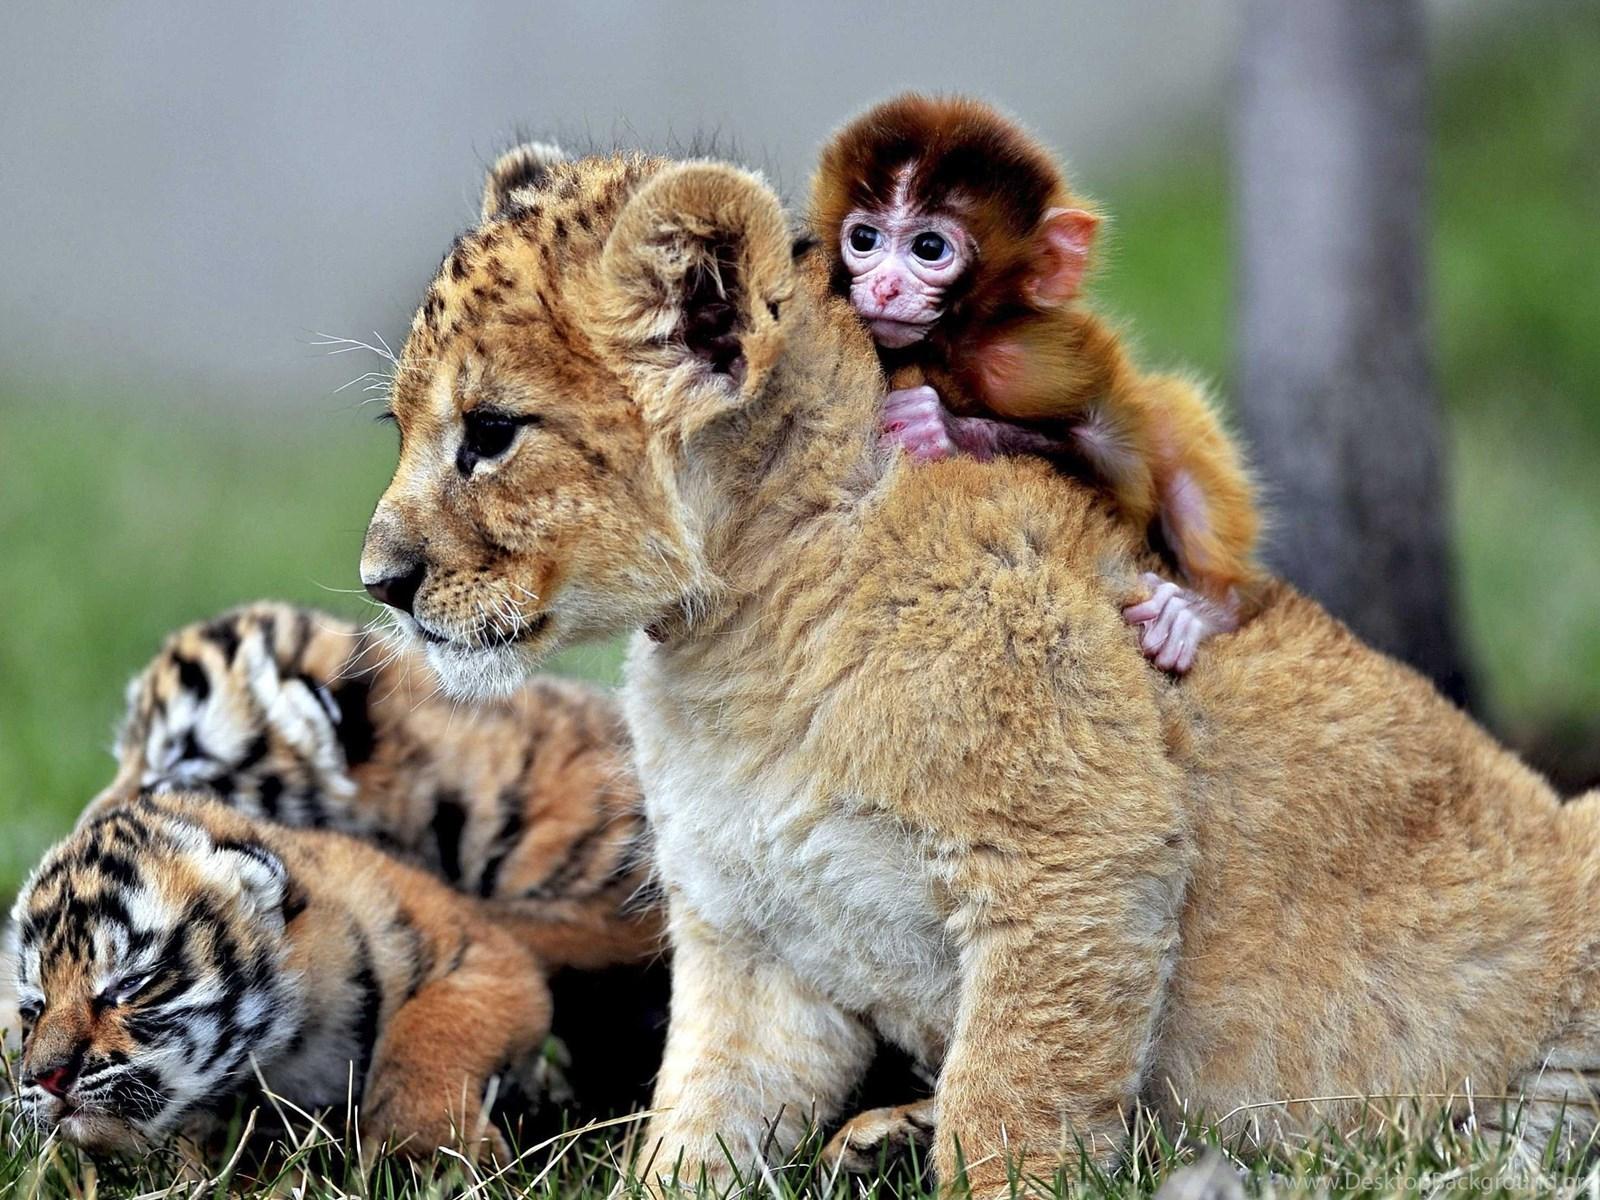 Animal Wallpapers Hd Animal Images Natural Life Wild: Cute Animal Wallpapers, Puffy, Hd Wild Life Photos, Pet